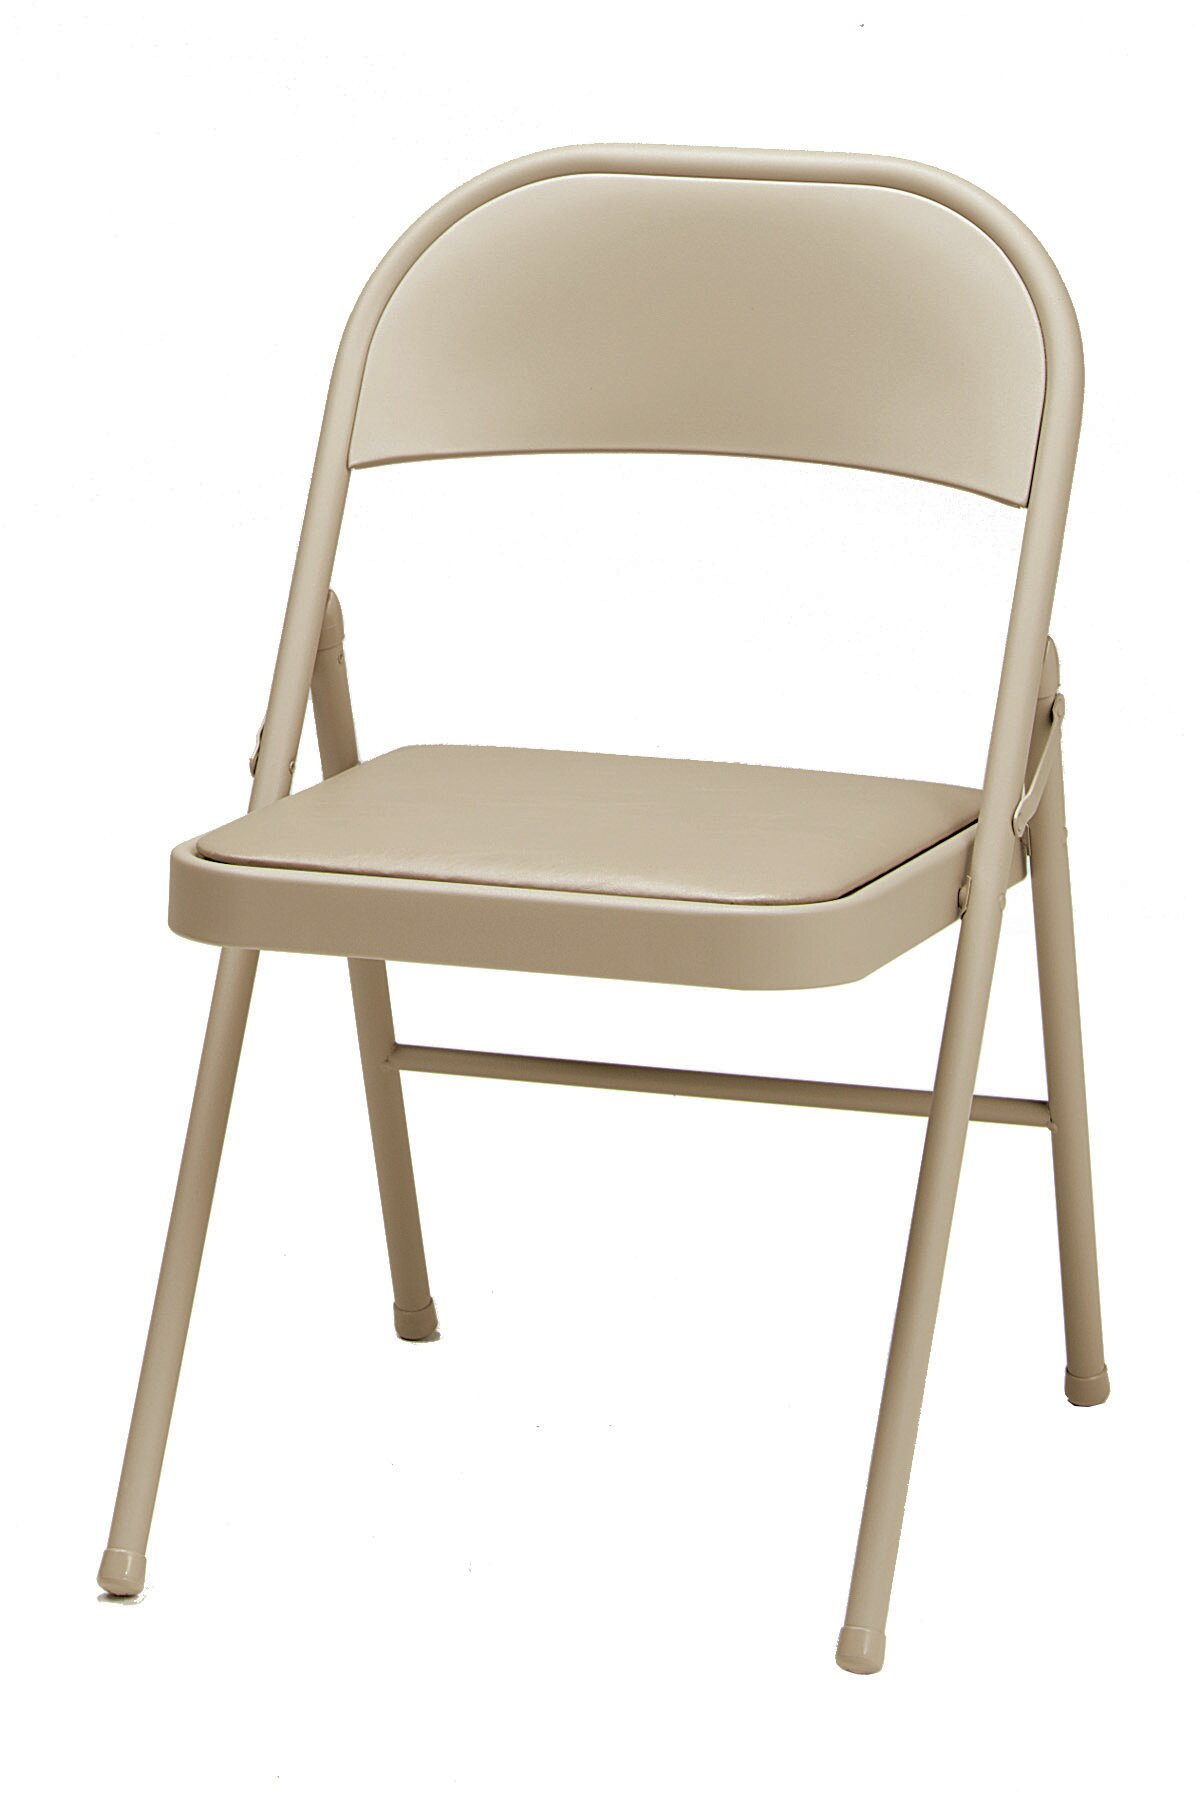 Sensational Single Vinyl Padded Folding Chair Theyellowbook Wood Chair Design Ideas Theyellowbookinfo